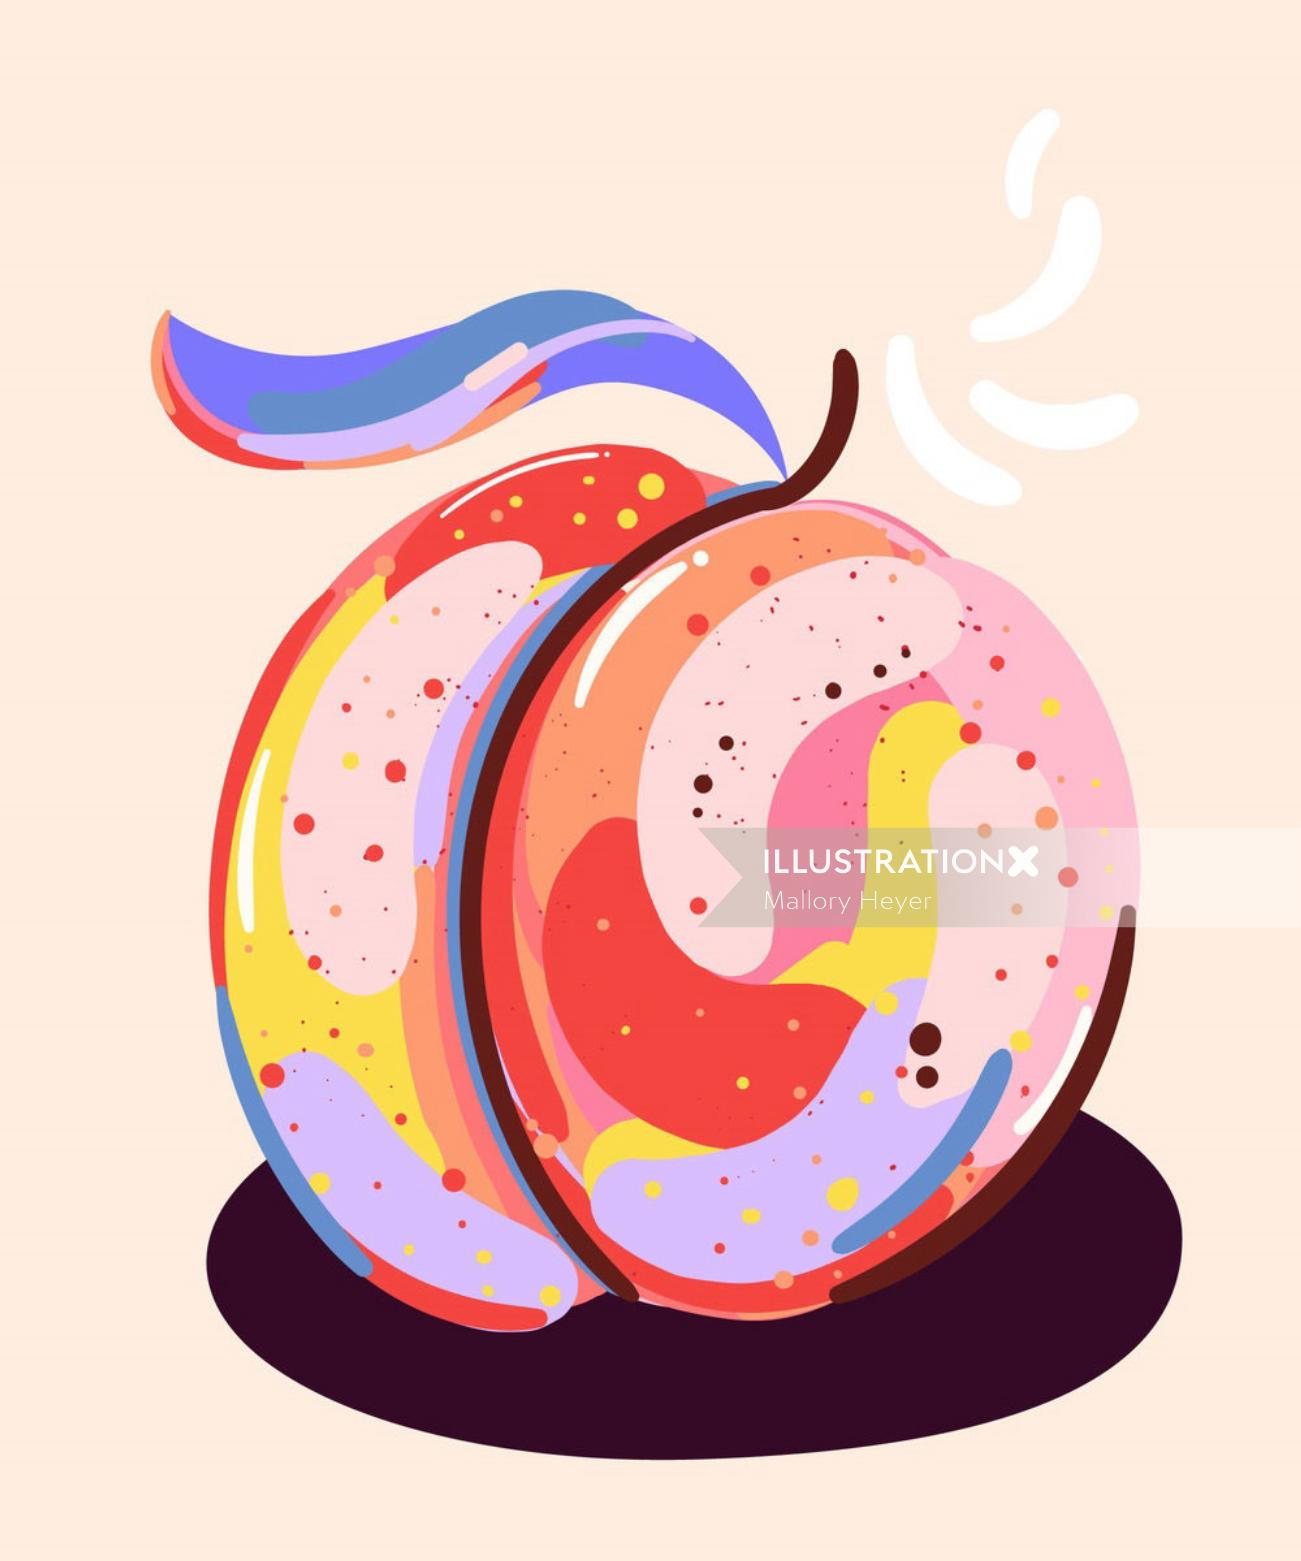 Peach illustration by Mallory Heyer